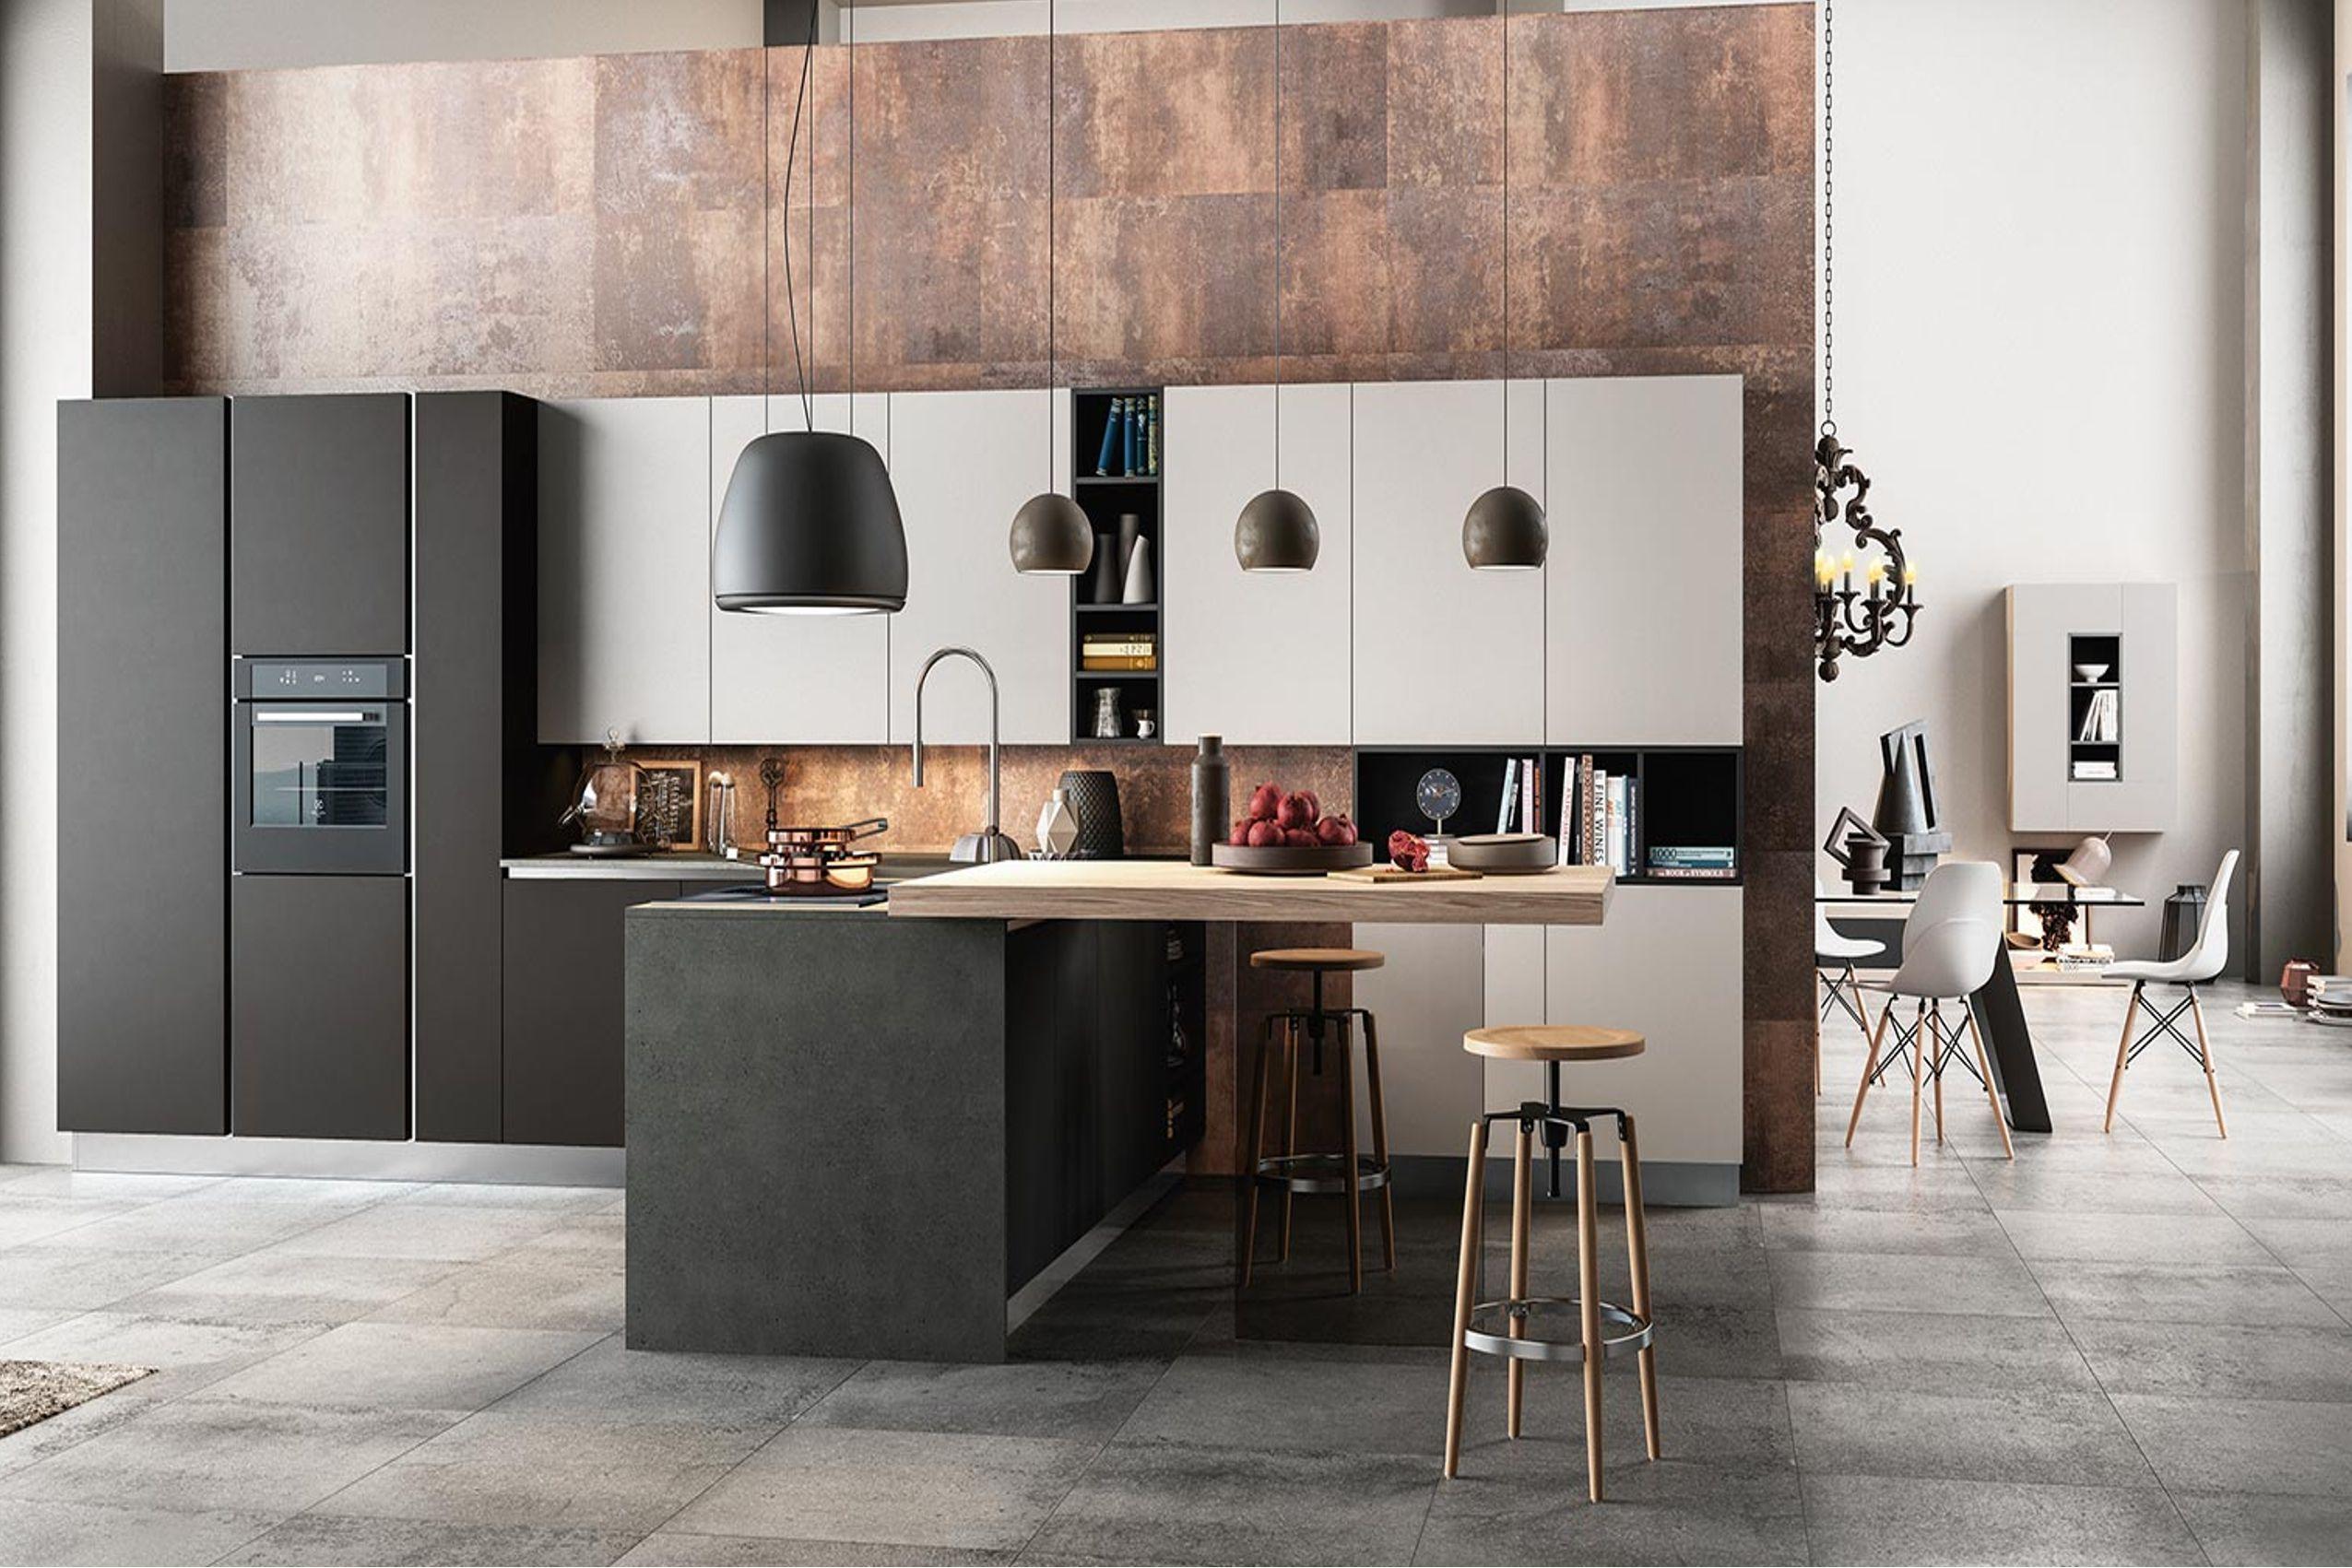 Cucine A Muro Foto cucine a parete con penisola moderne